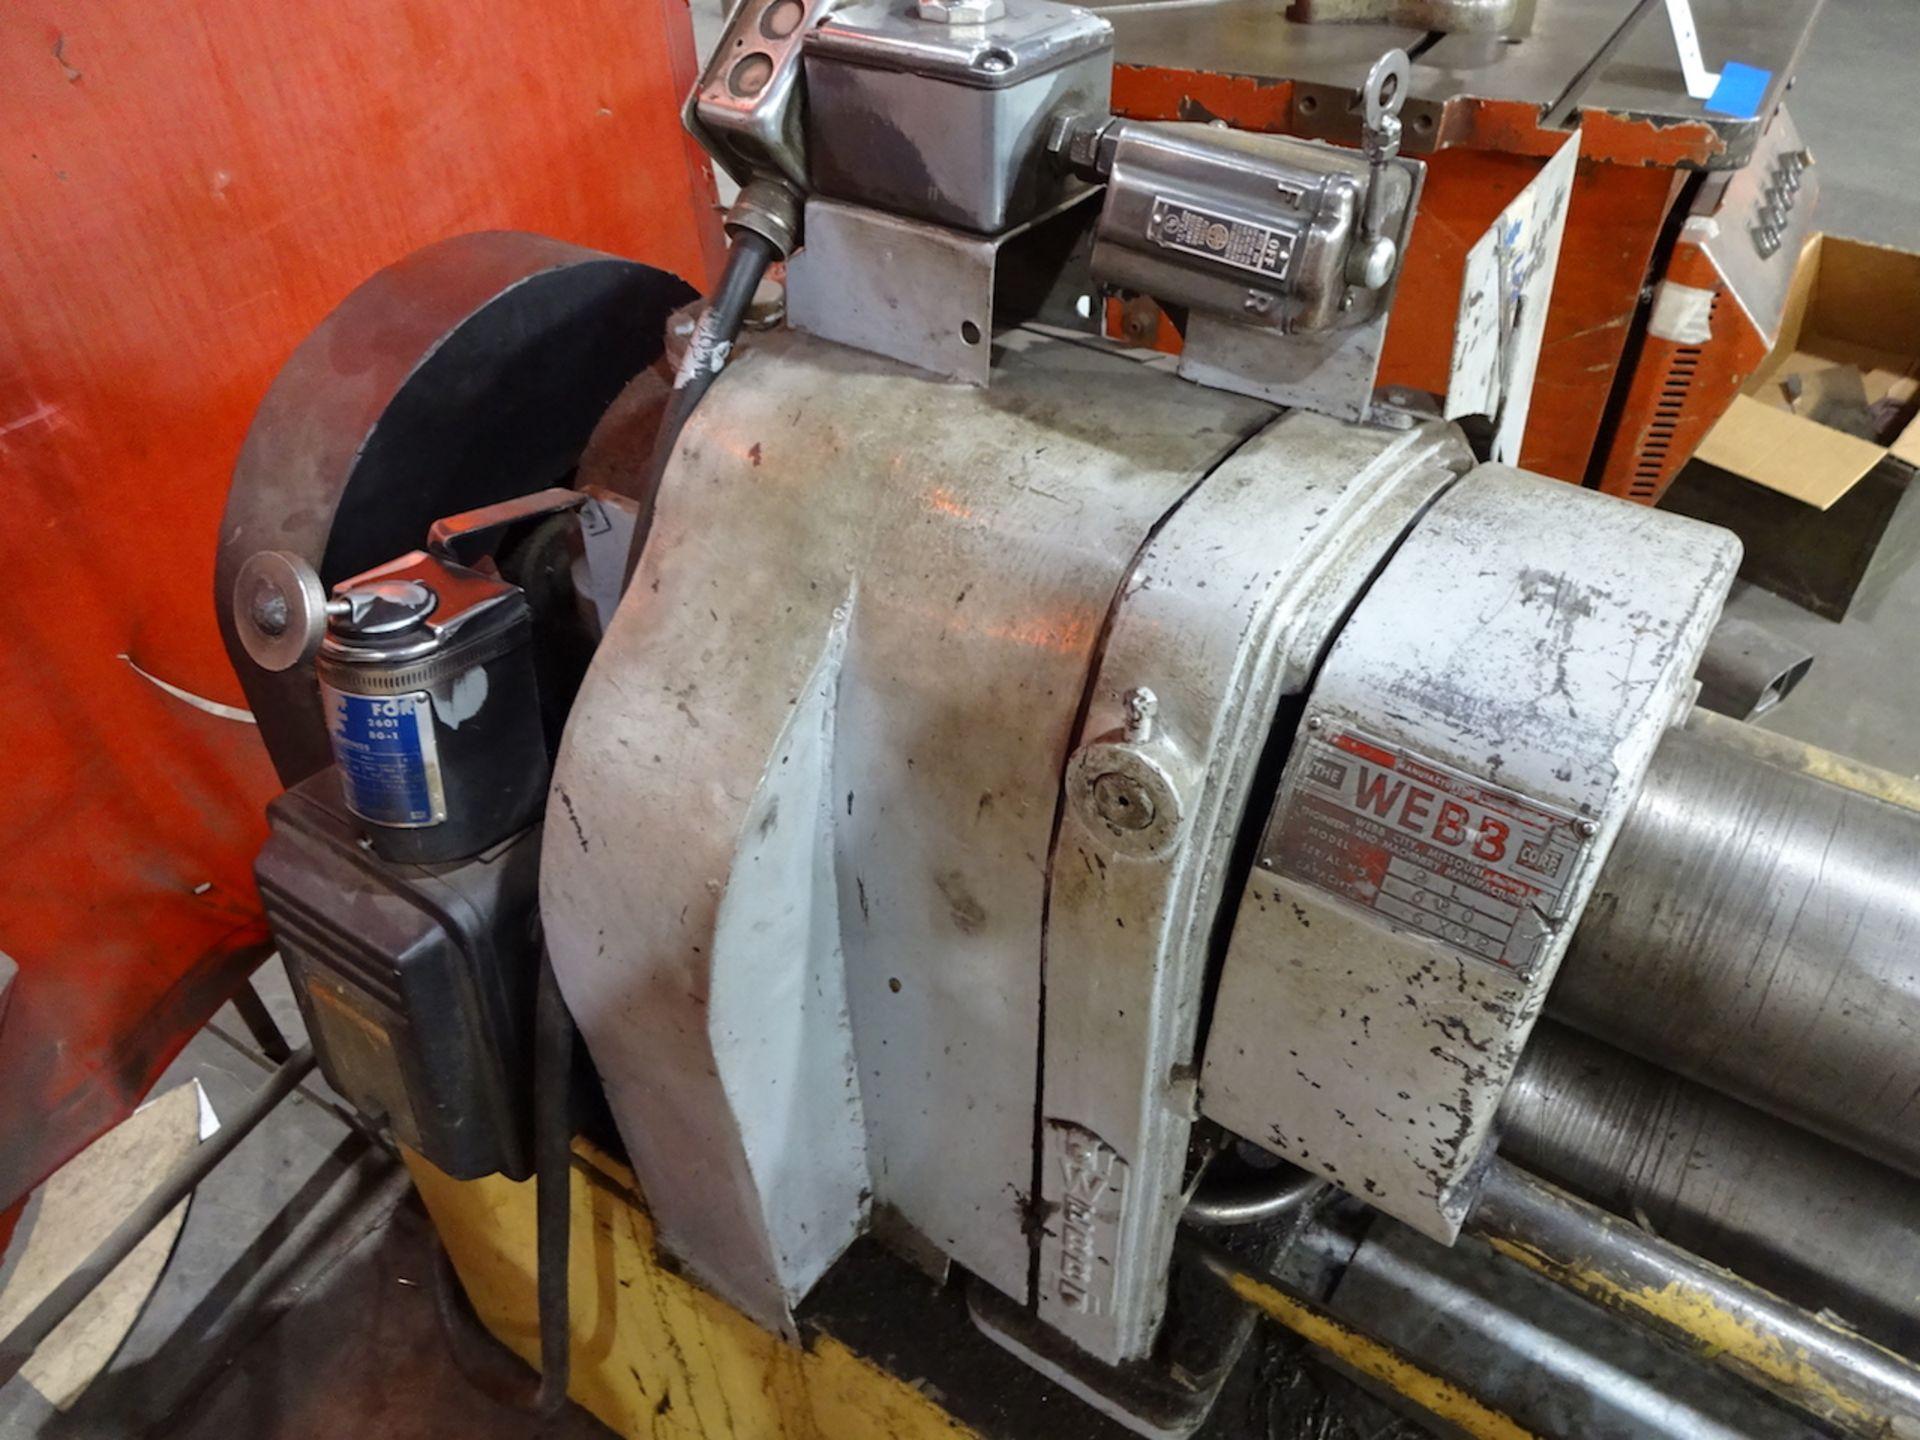 Lot 42 - Webb 6 ft. x 12 ga. Model 2L Bending Roll, S/N 620, 5 in. Dia. Rolls, AC Motor Controls